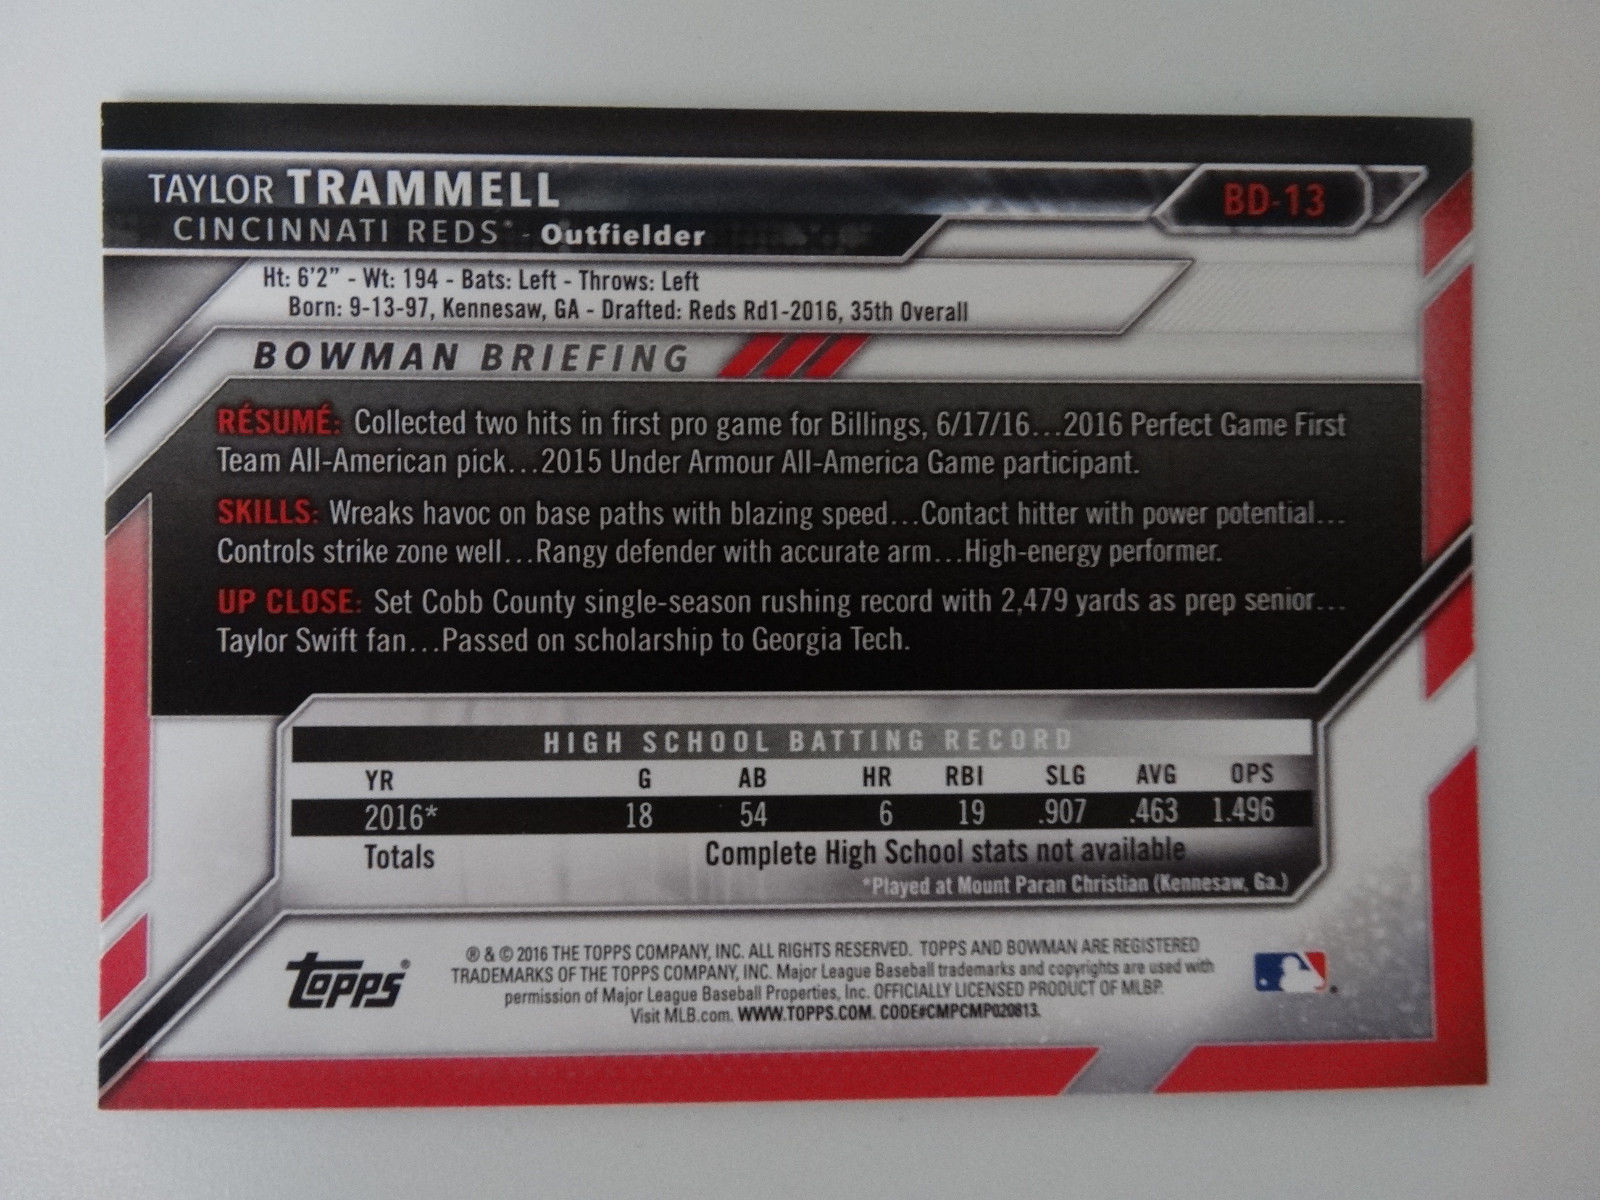 2016 Bowman Draft #BD-13 Taylor Trammell Cincinnati Reds Rookie RC Baseball Card image 2